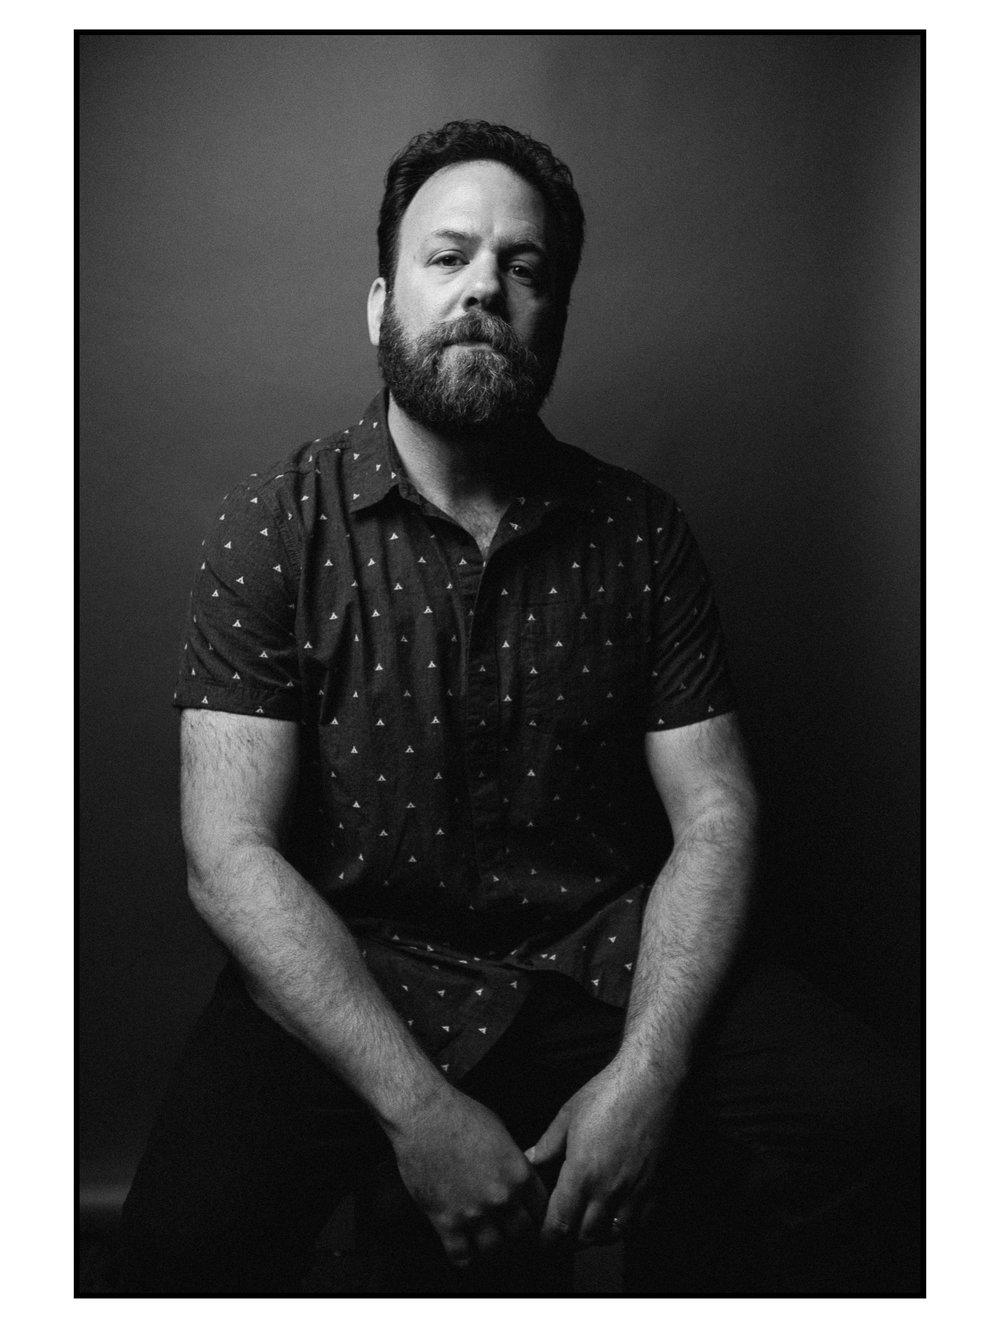 Photo by Adrienne Battistella, 2018